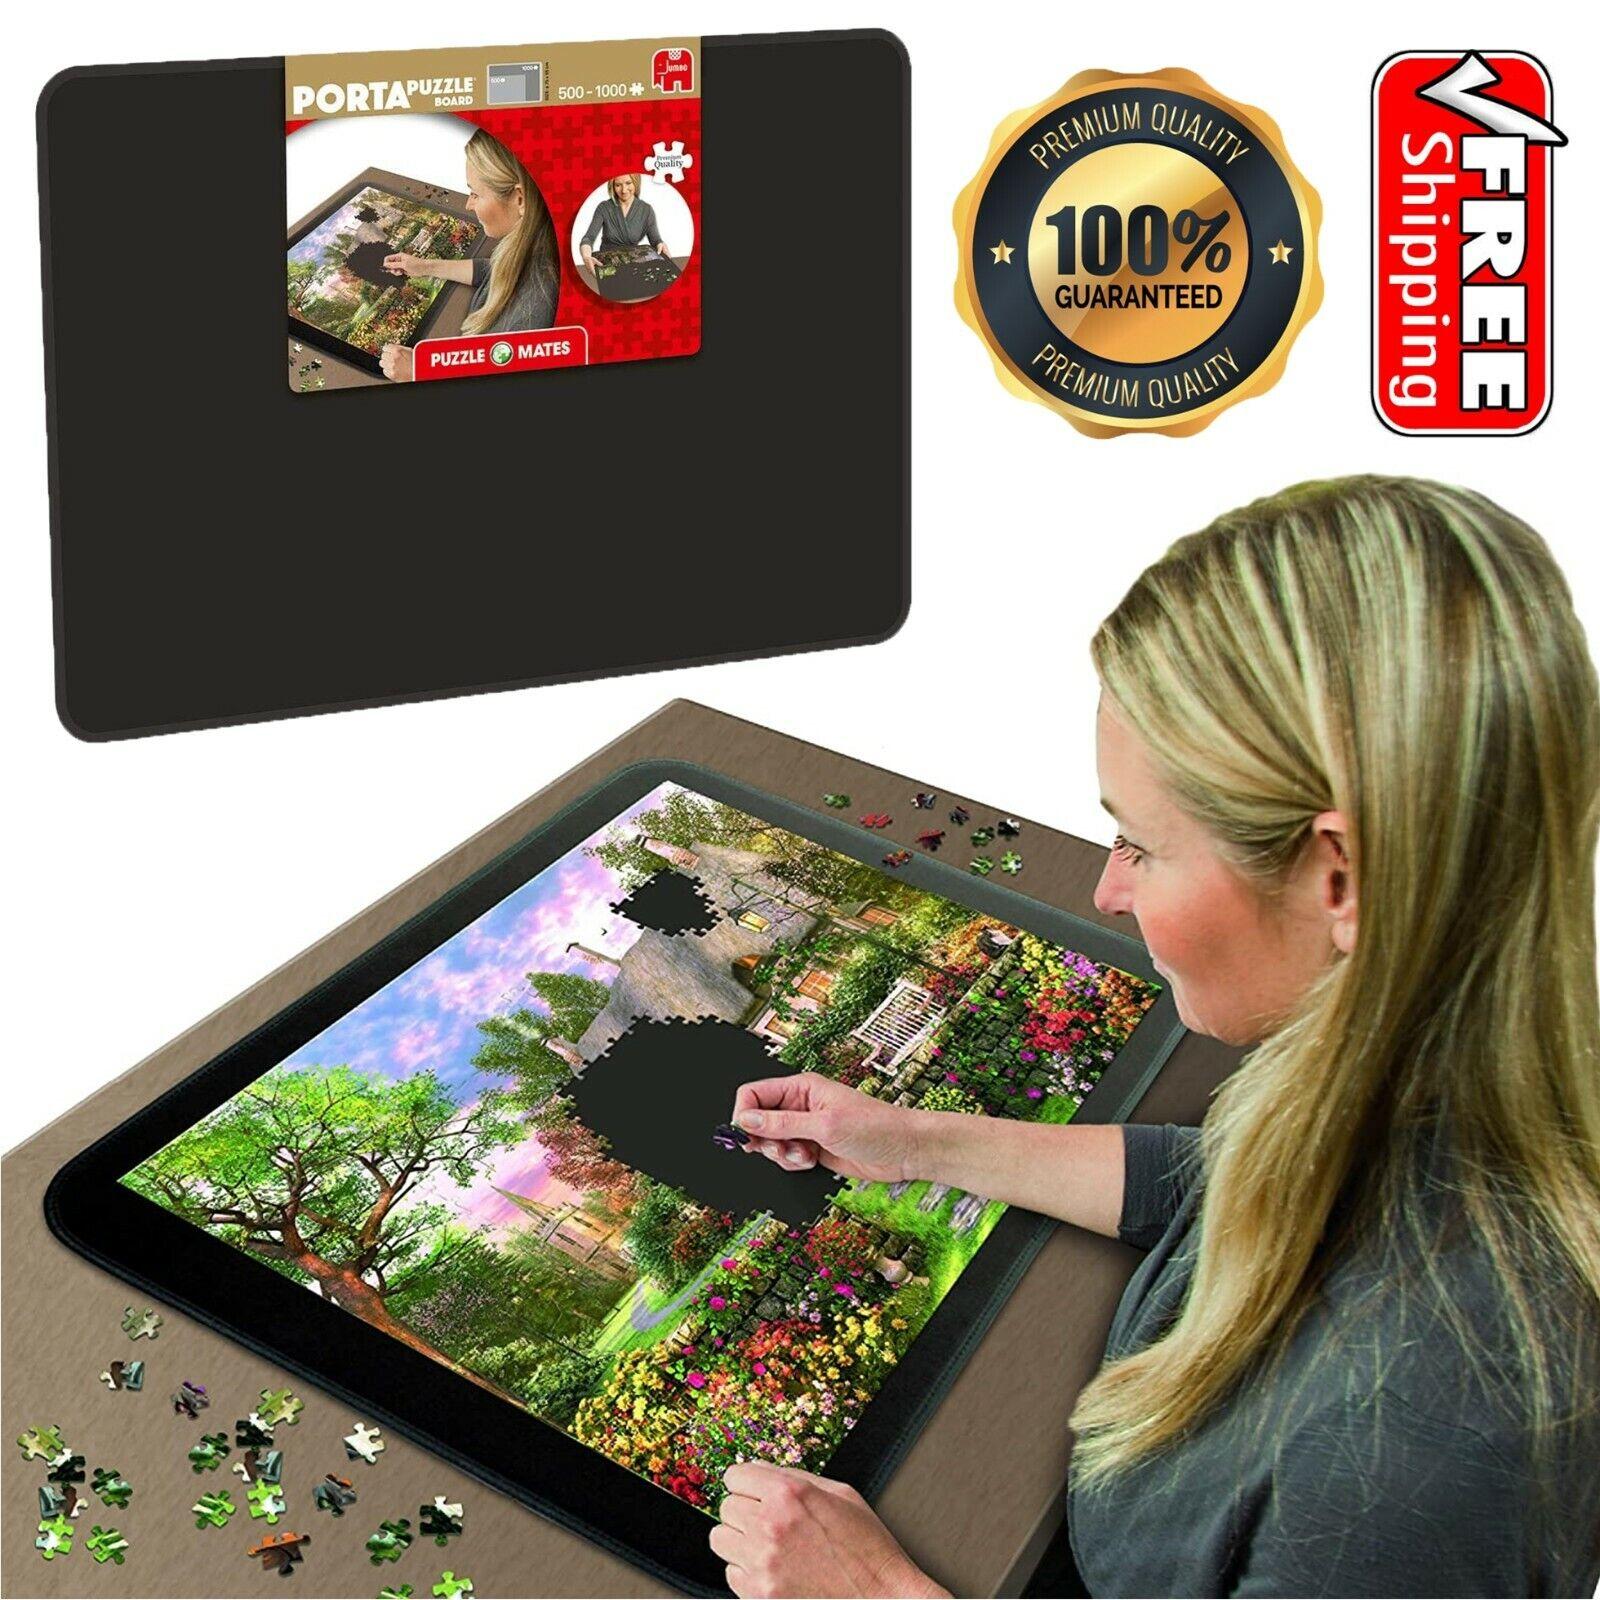 Jumbo Jigsaw Puzzle Mat 500-1000Pc Puzzle Board Storage Portable 54x75cm